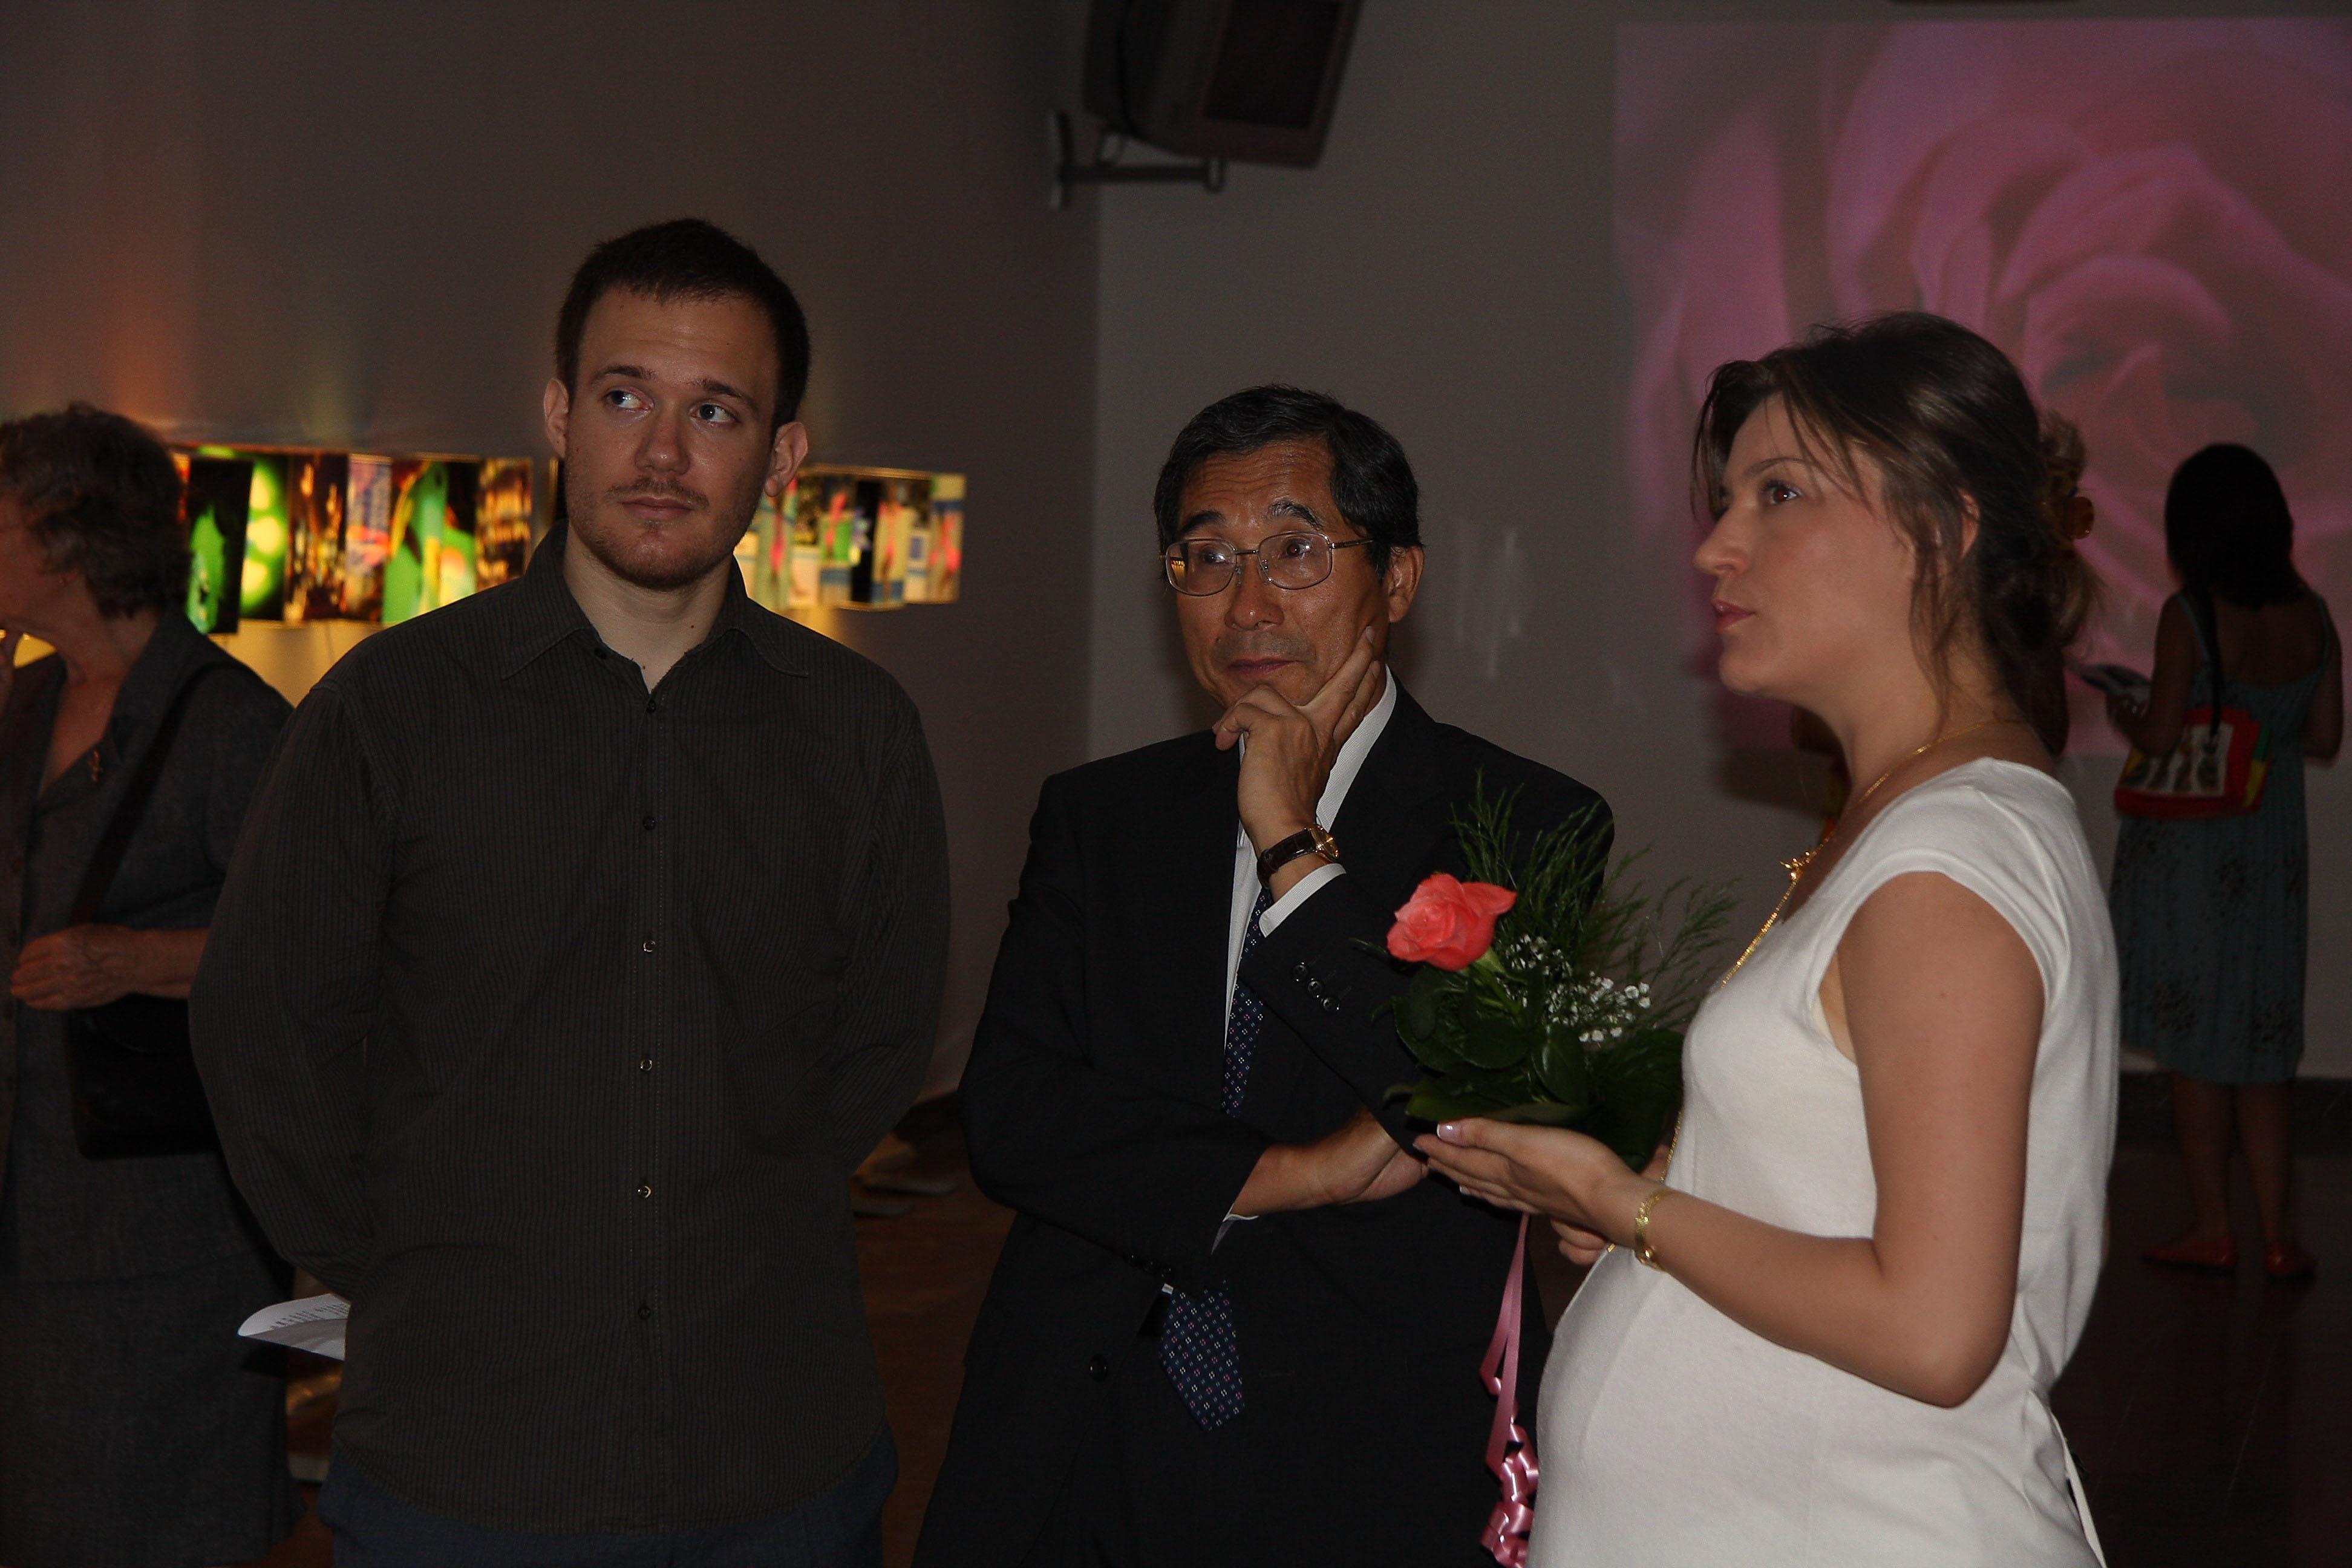 02 His Excellency Toshio Tsunozaki, Ambassador of Japan in Serbia